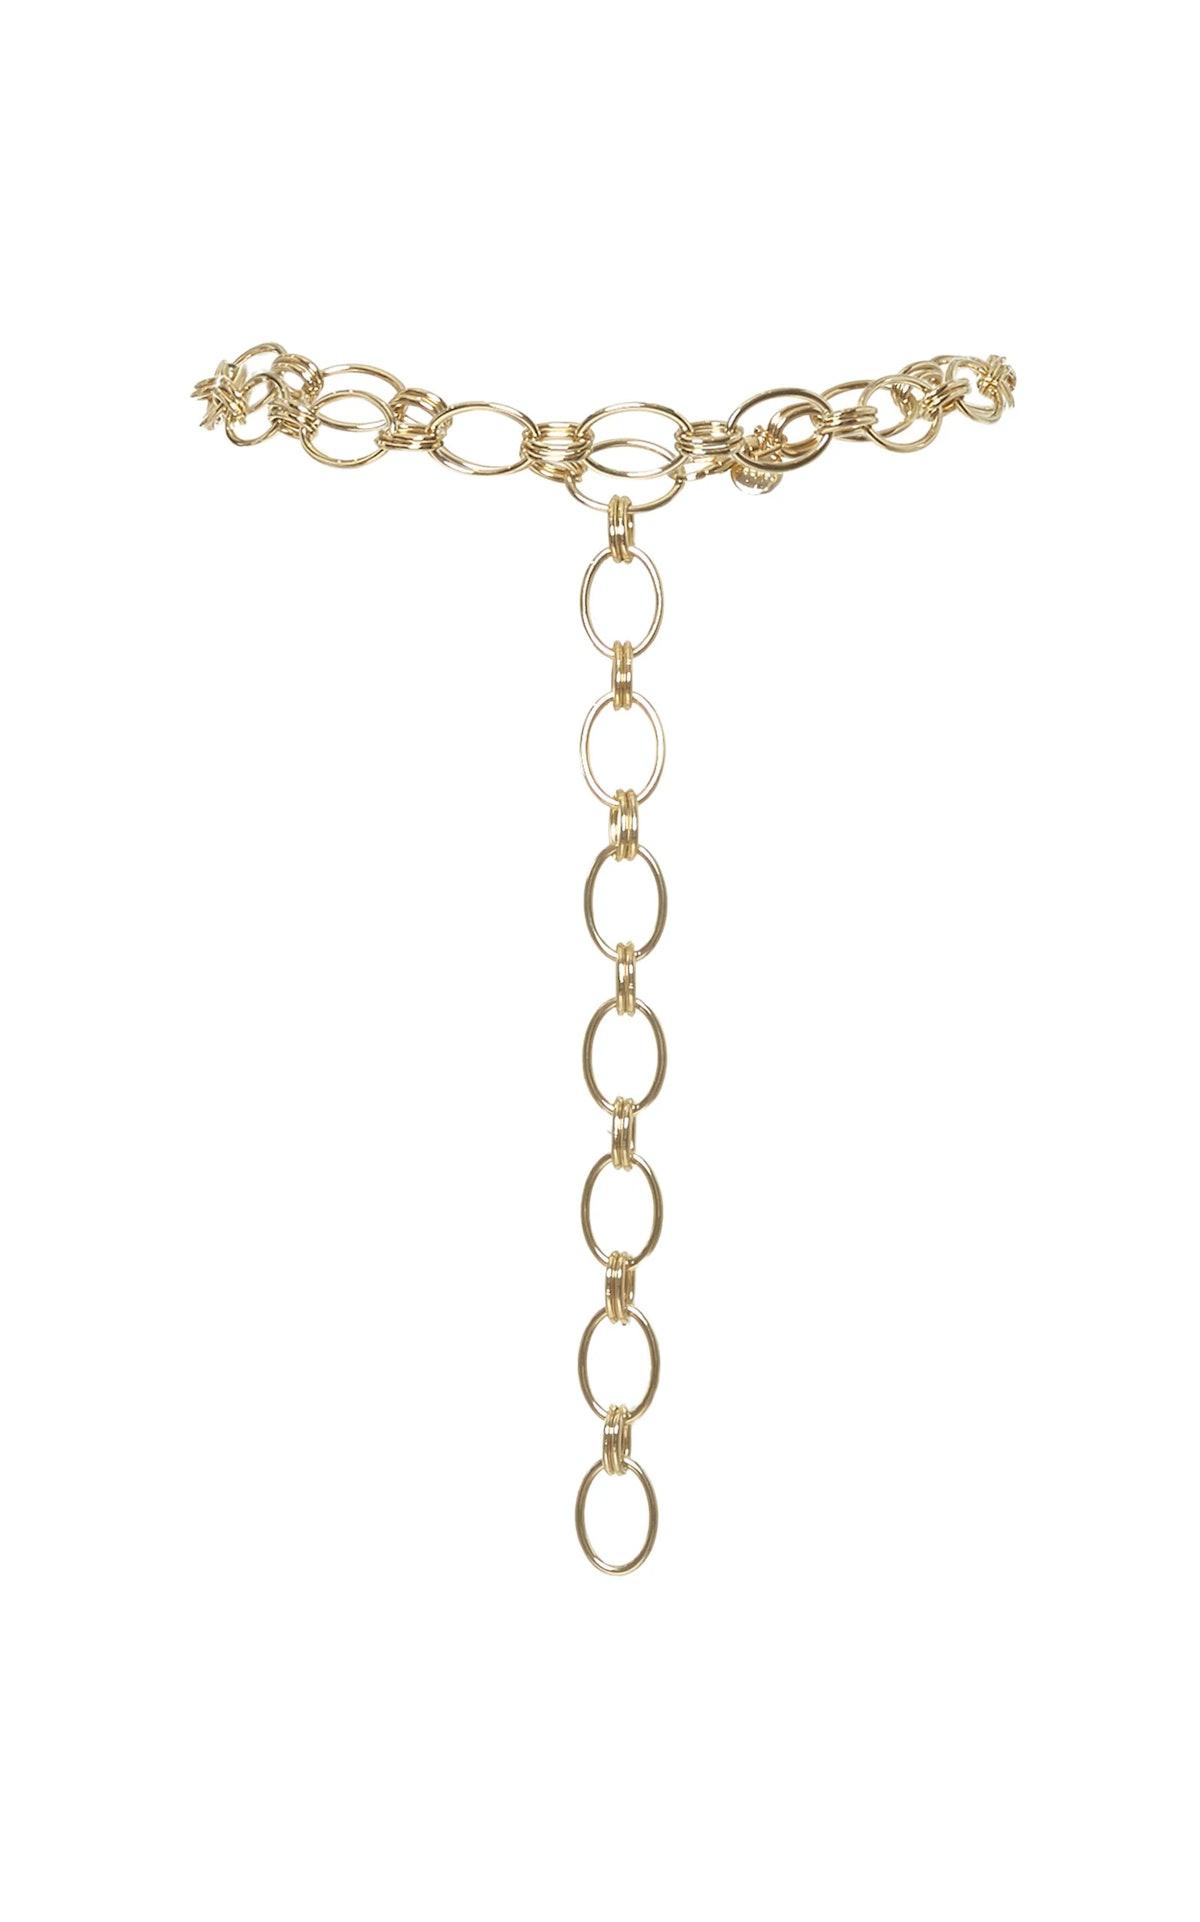 Clara II Chain-Link Belt